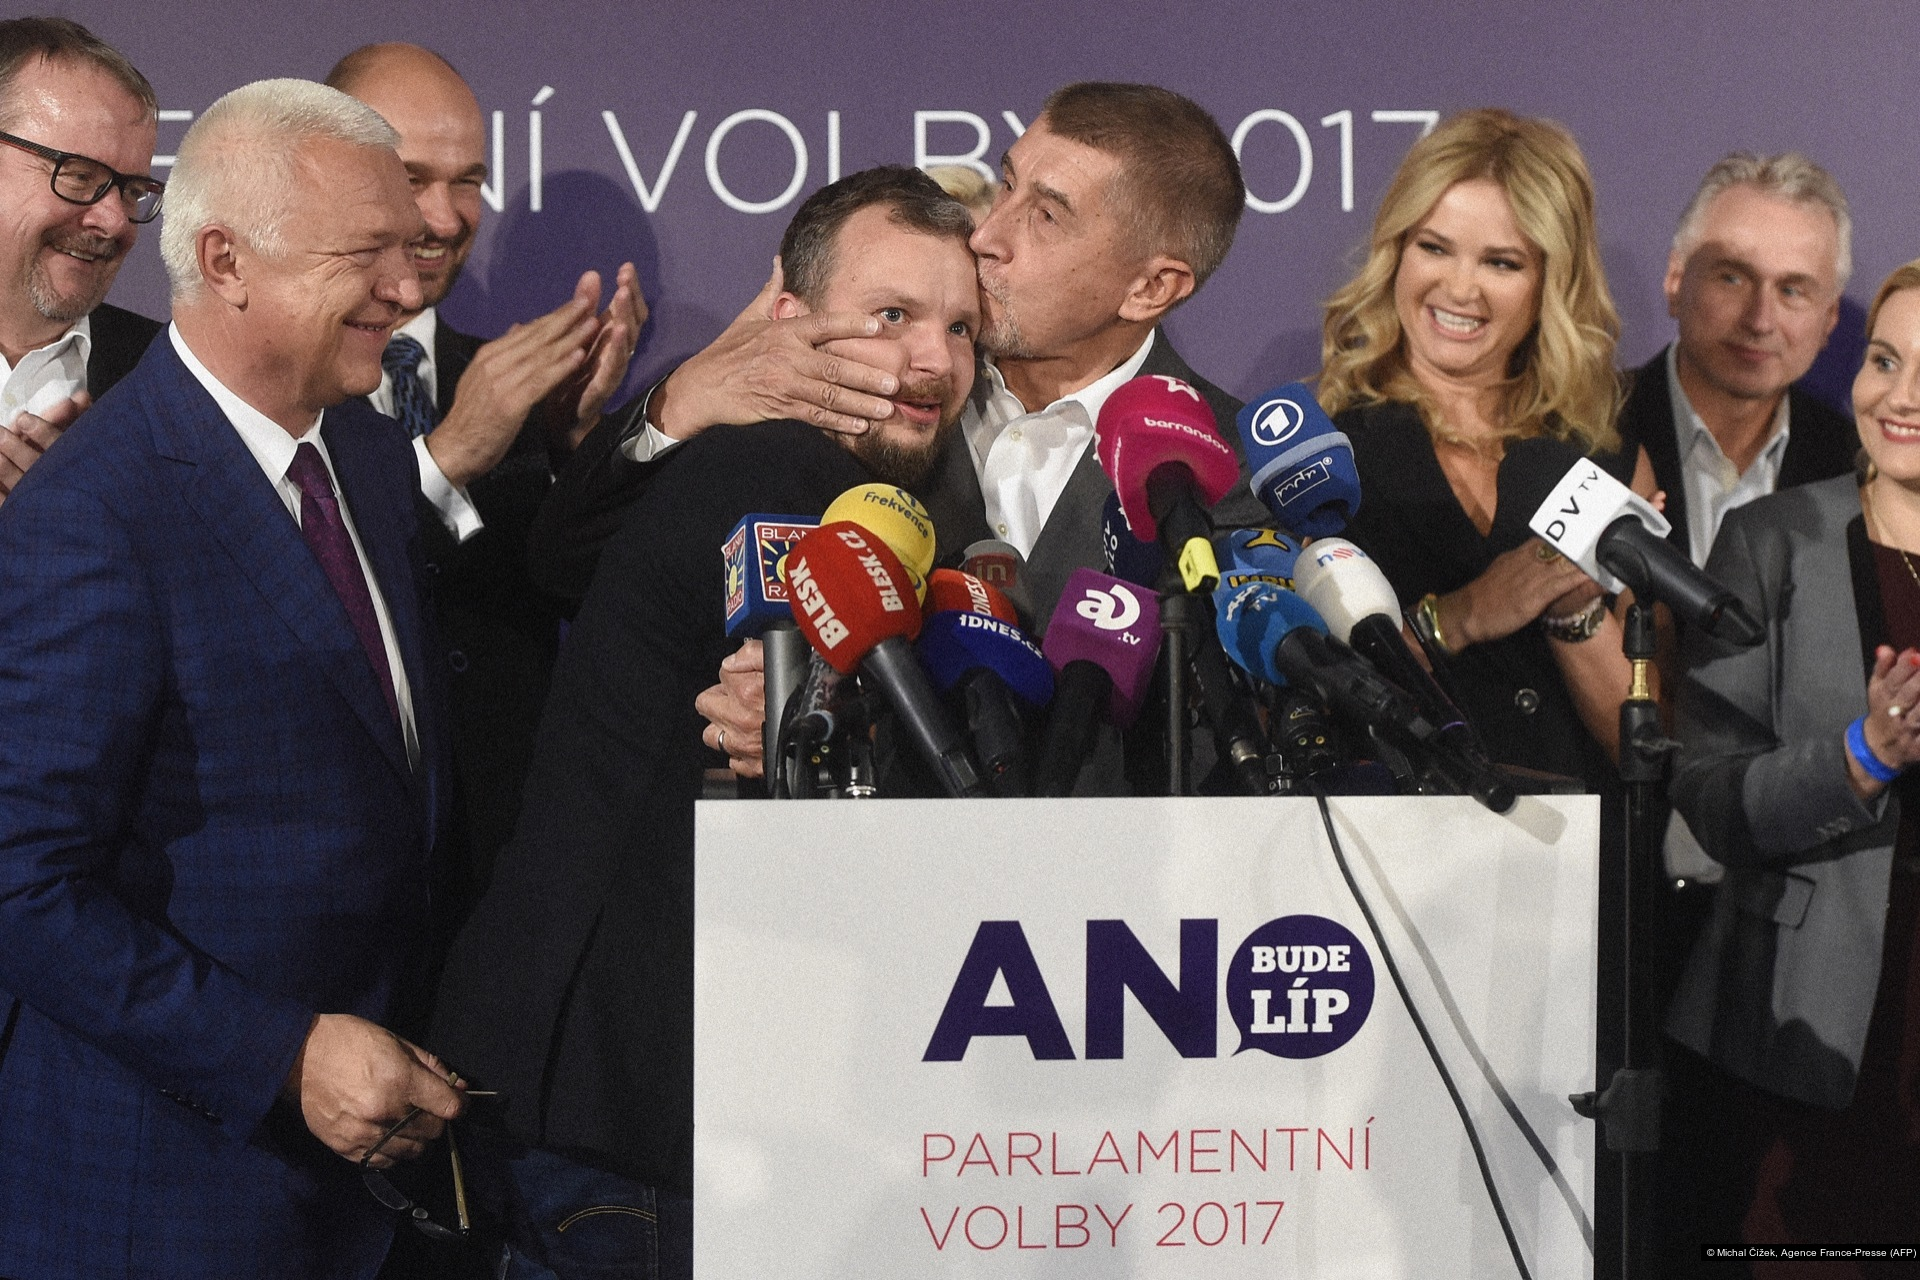 Michal Čížek, Agence France-Presse (AFP)